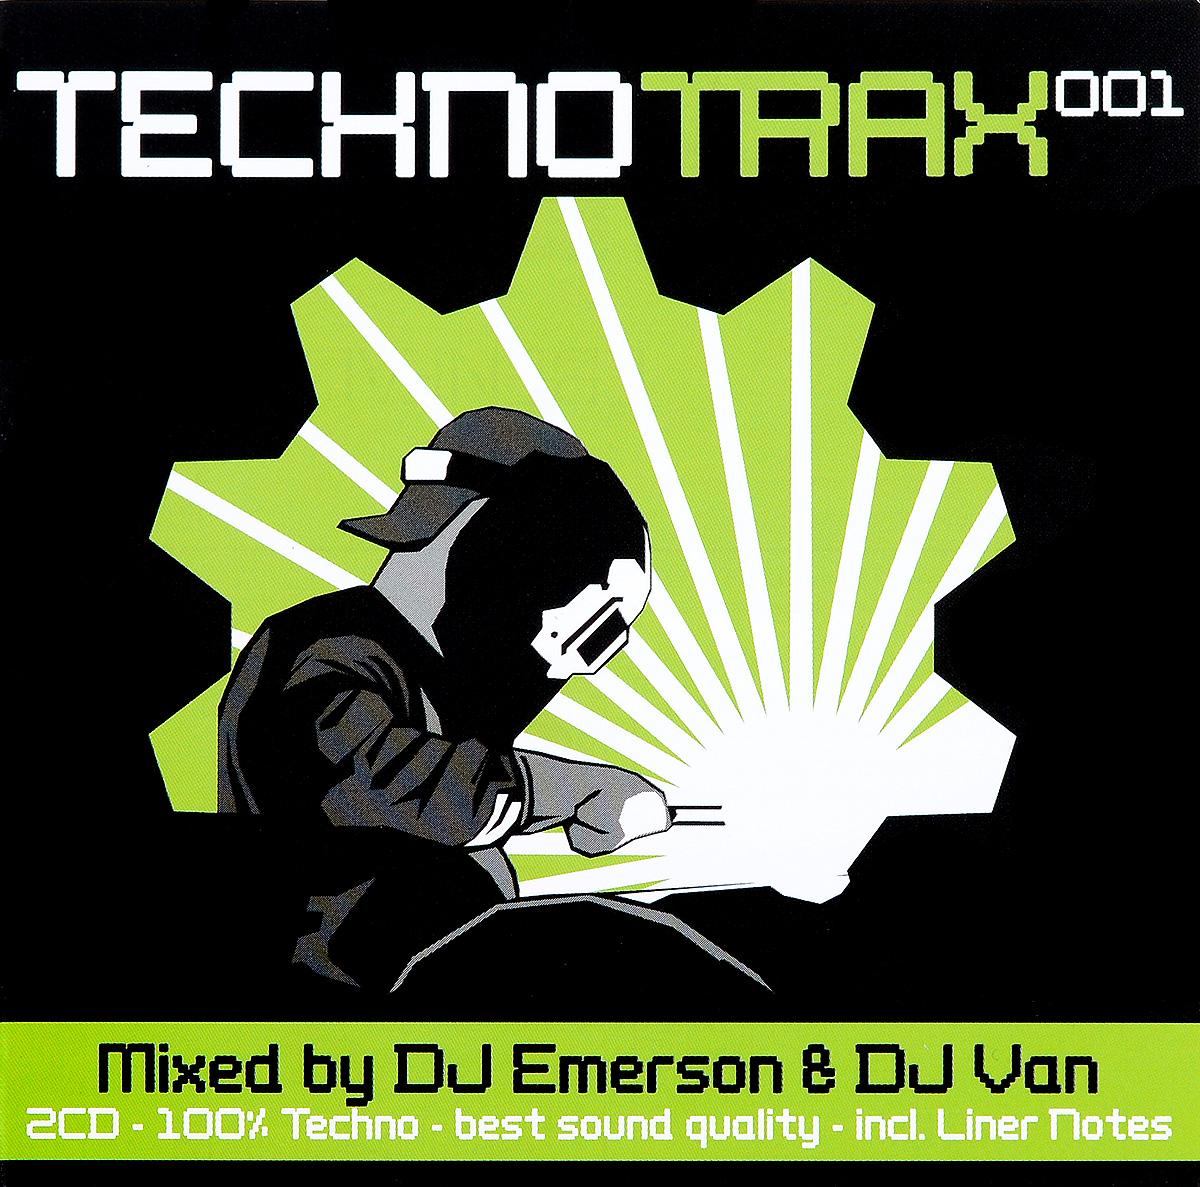 Techno Trax 001 (2 CD) 2014 2 Audio CD